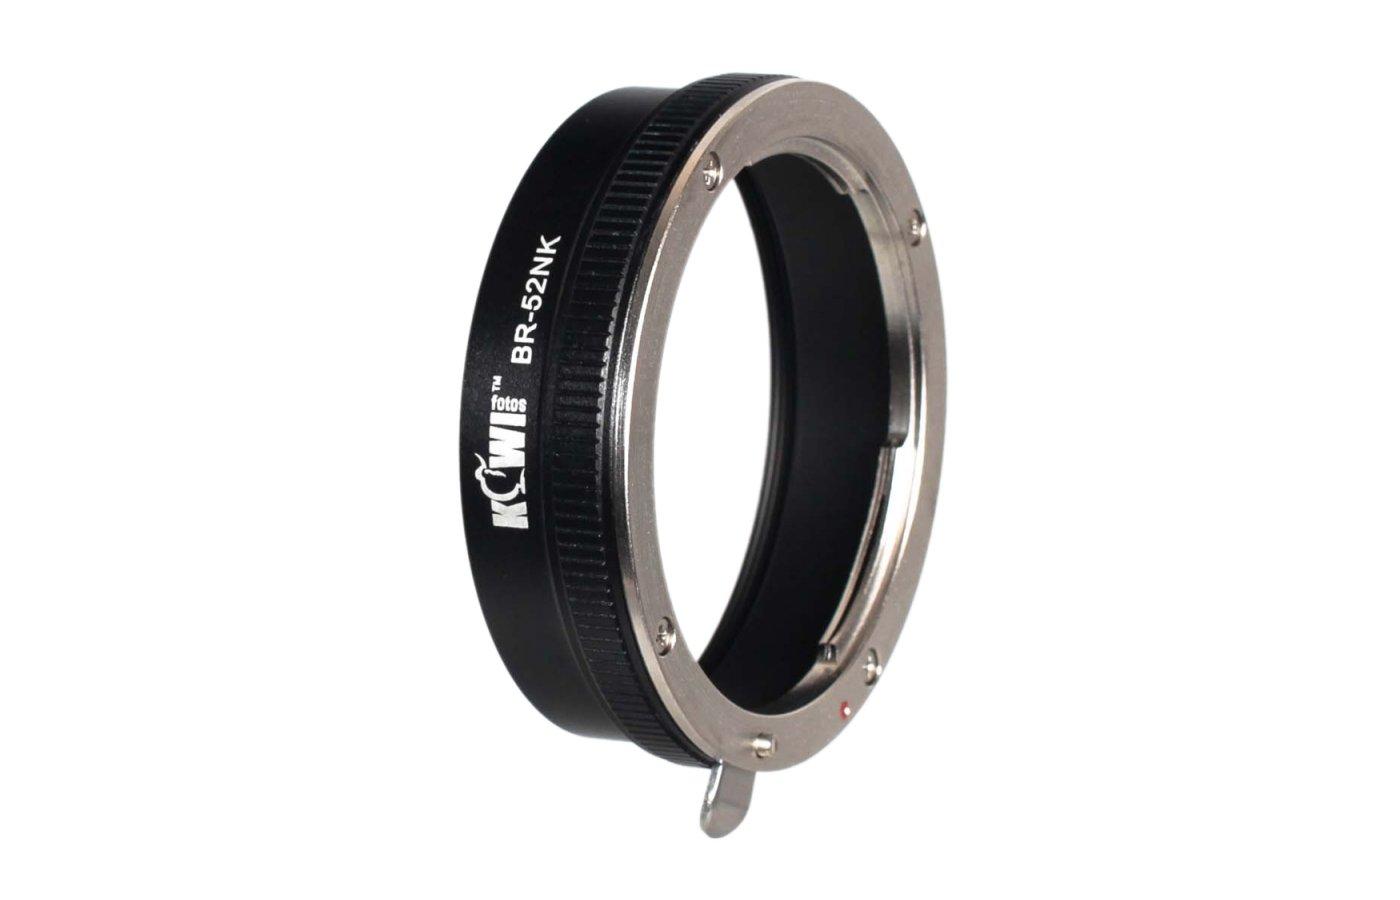 JJC KIWIFOTOS BR-52NK Переходное кольцо адаптер фильтра для NIKKOR 52 mm